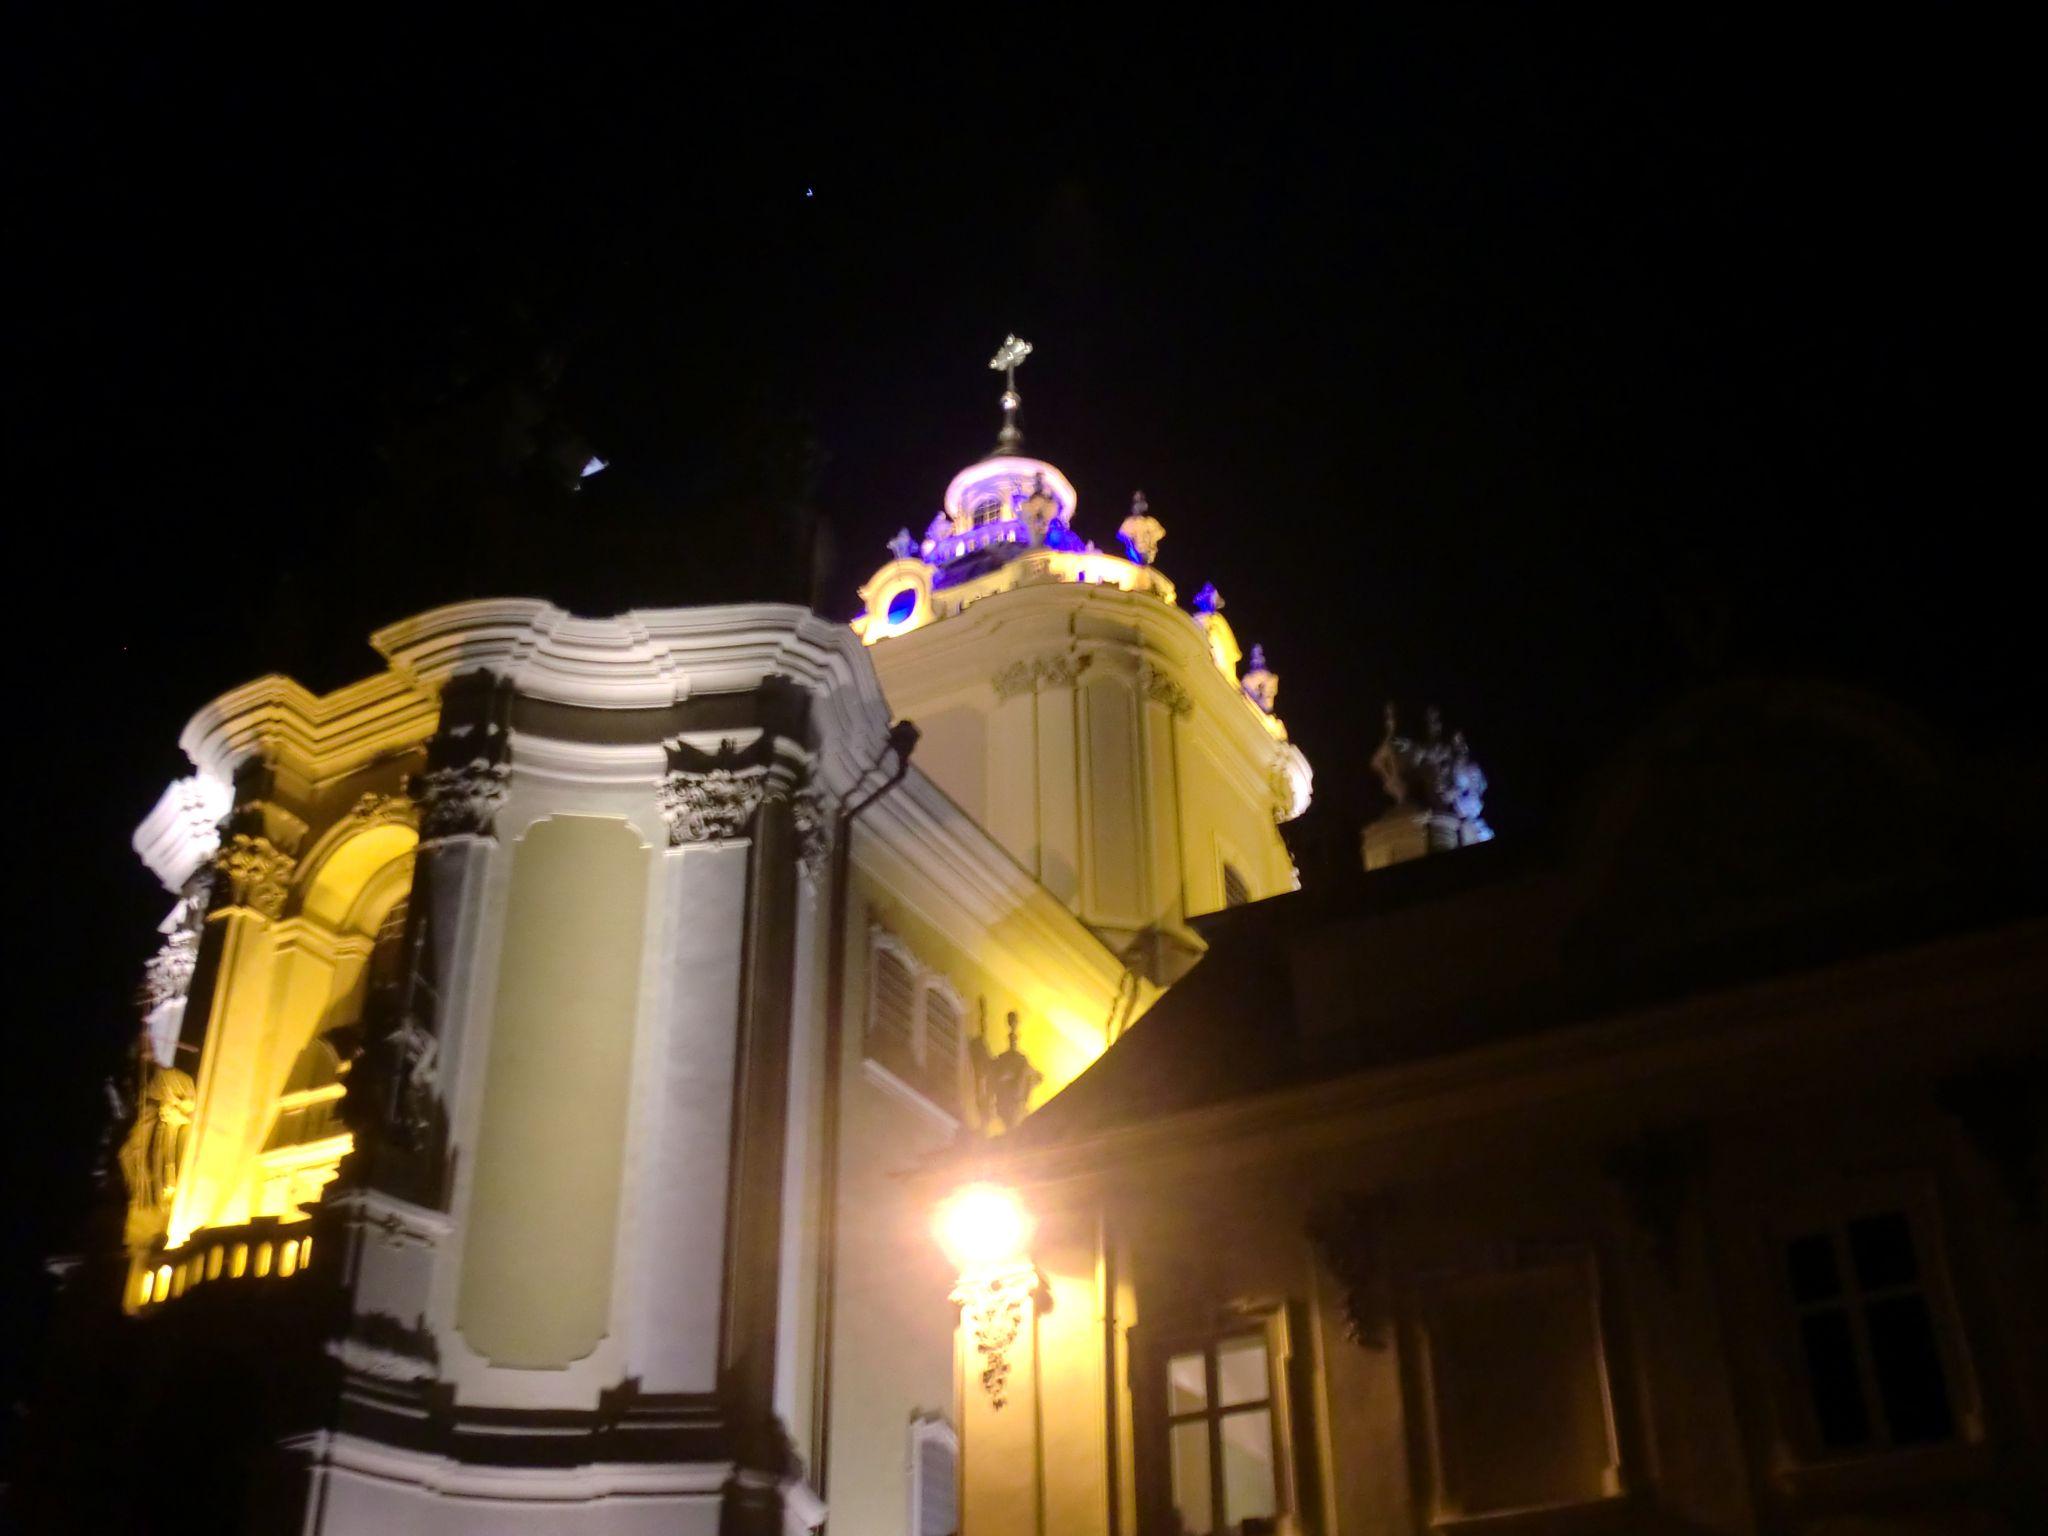 Lviv cathedral 3 - Lviv, the Ukrainian pearl